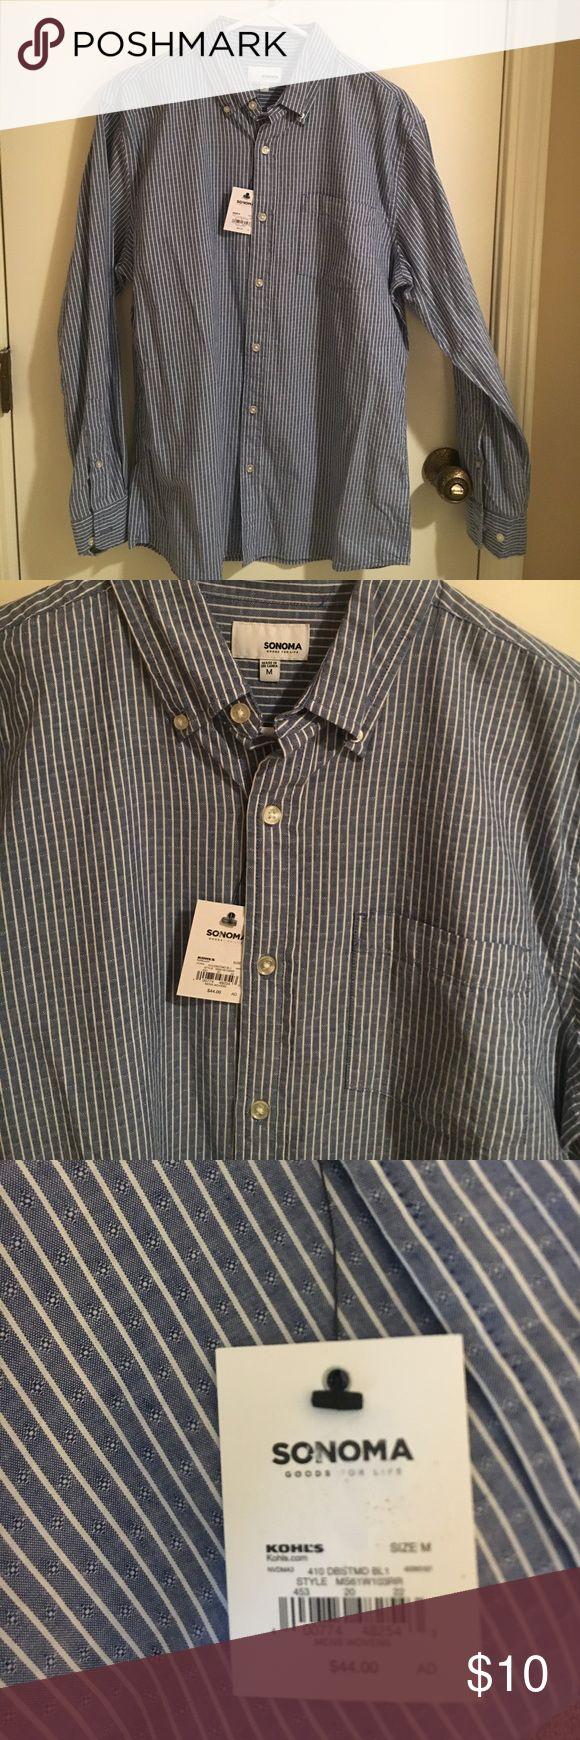 NWT!! Dressy or casual button down! NWT dressy or casual button down! Great with khakis or jeans Sonoma Shirts Casual Button Down Shirts